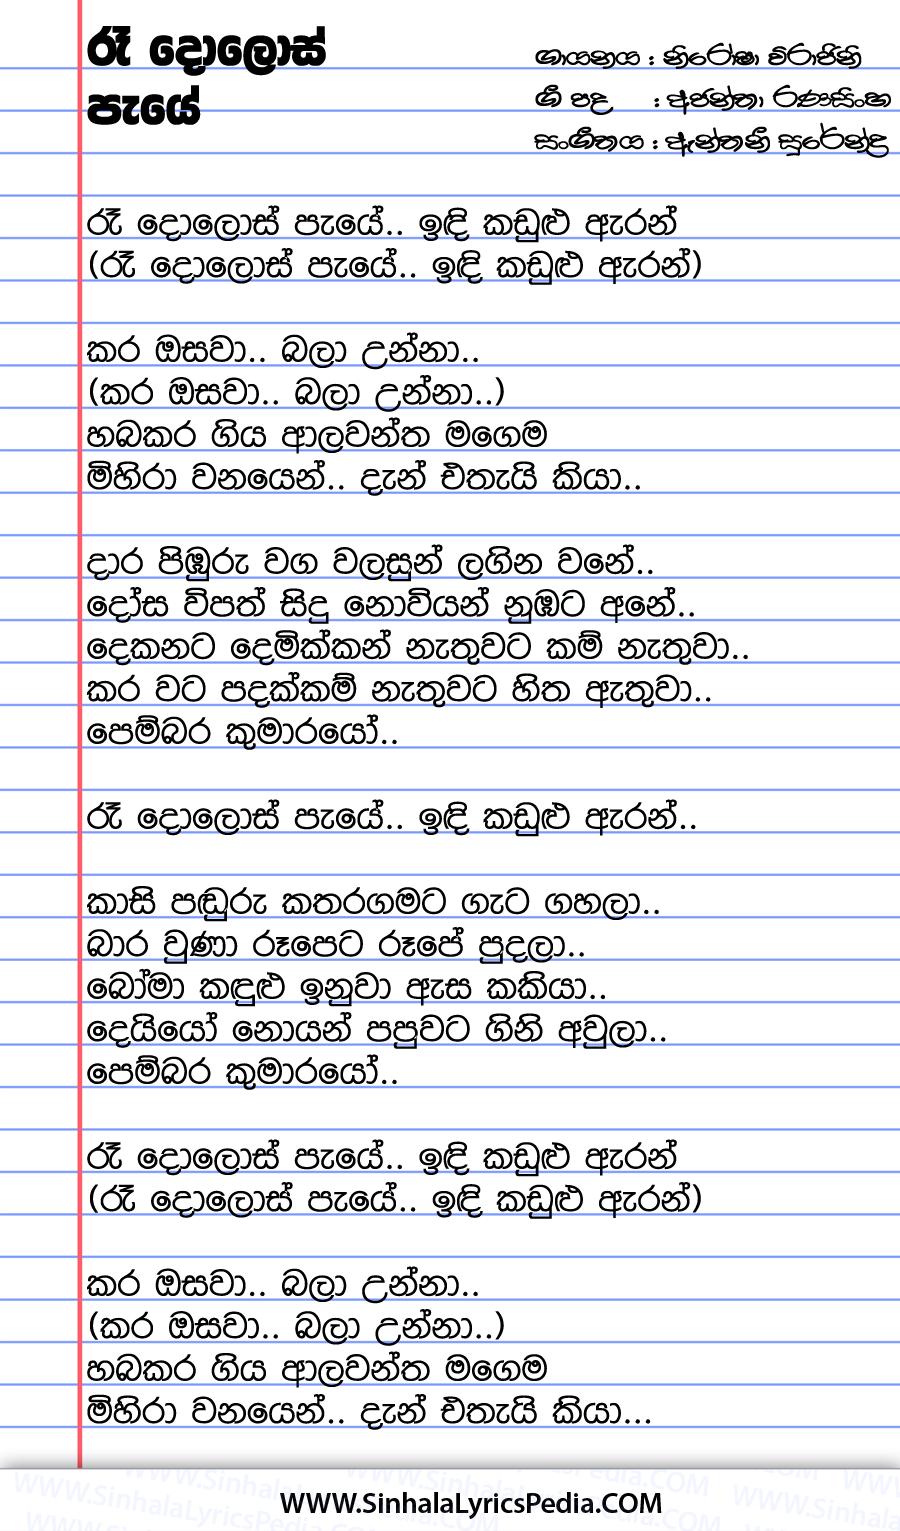 Ra Dolos Paye Song Lyrics